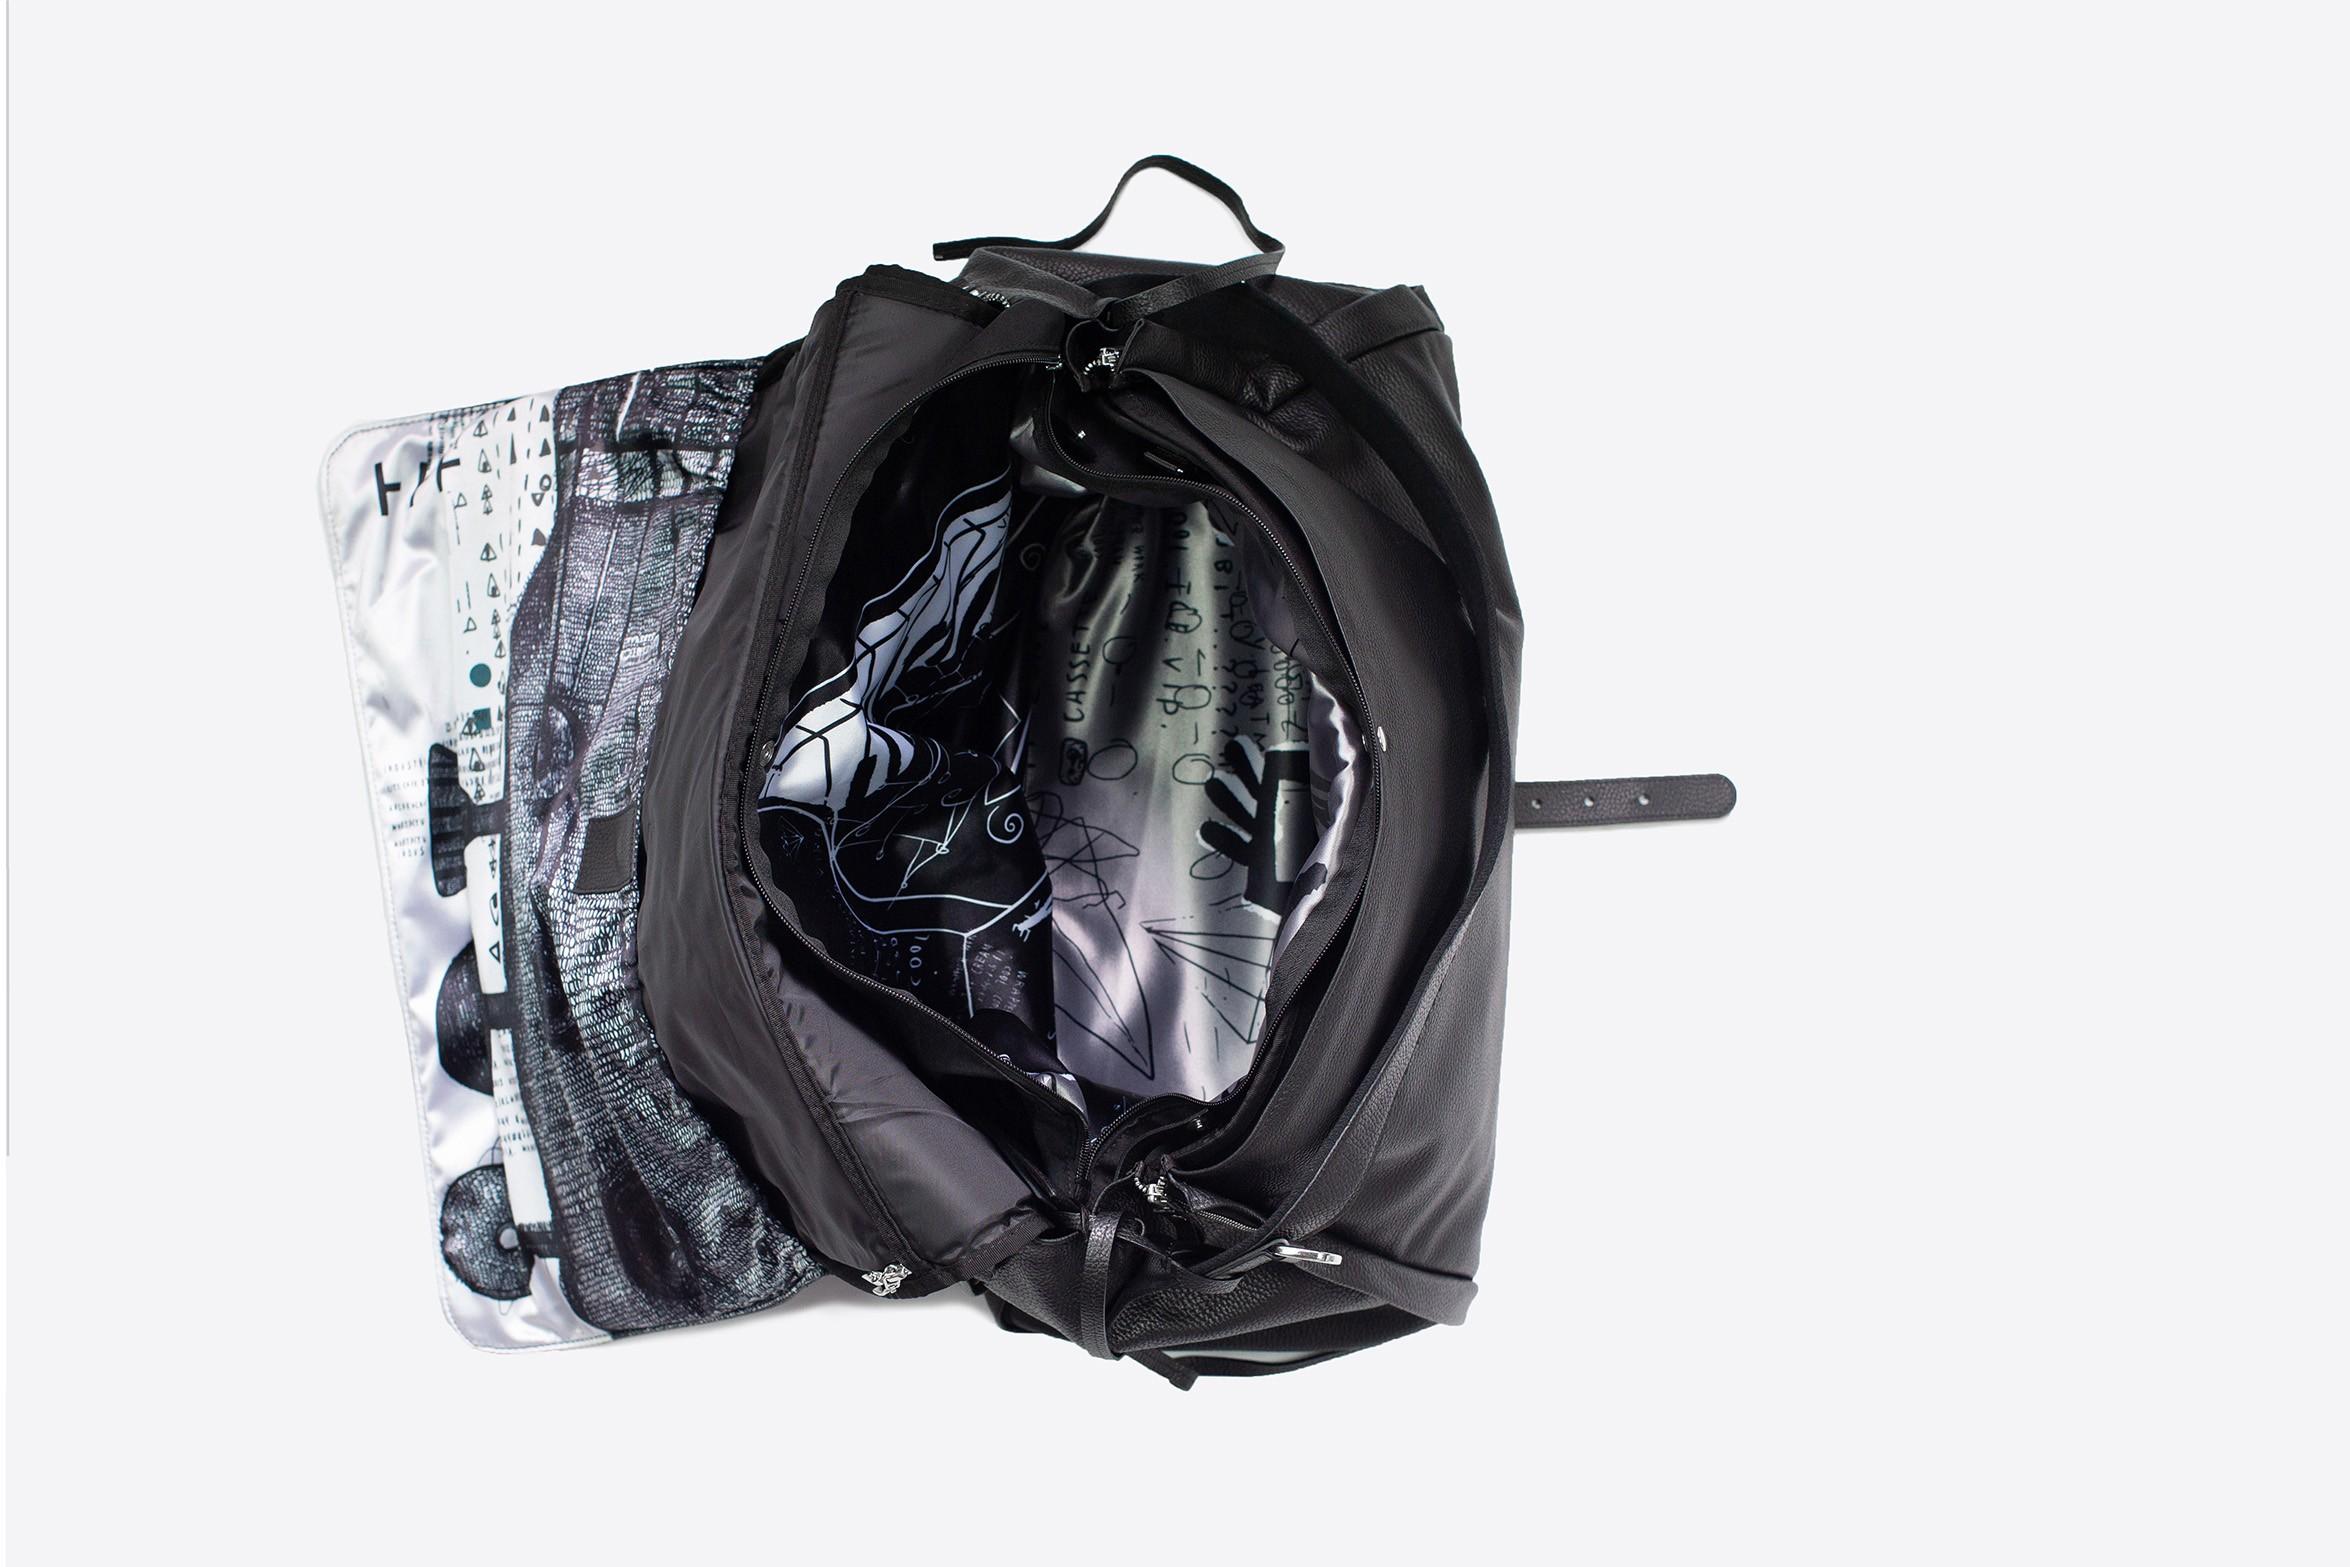 Borsa Weekender con porta abiti da viaggio | Garment Weekender Bag | Travel Garment Bag | LUDOVICO MARABOTTO